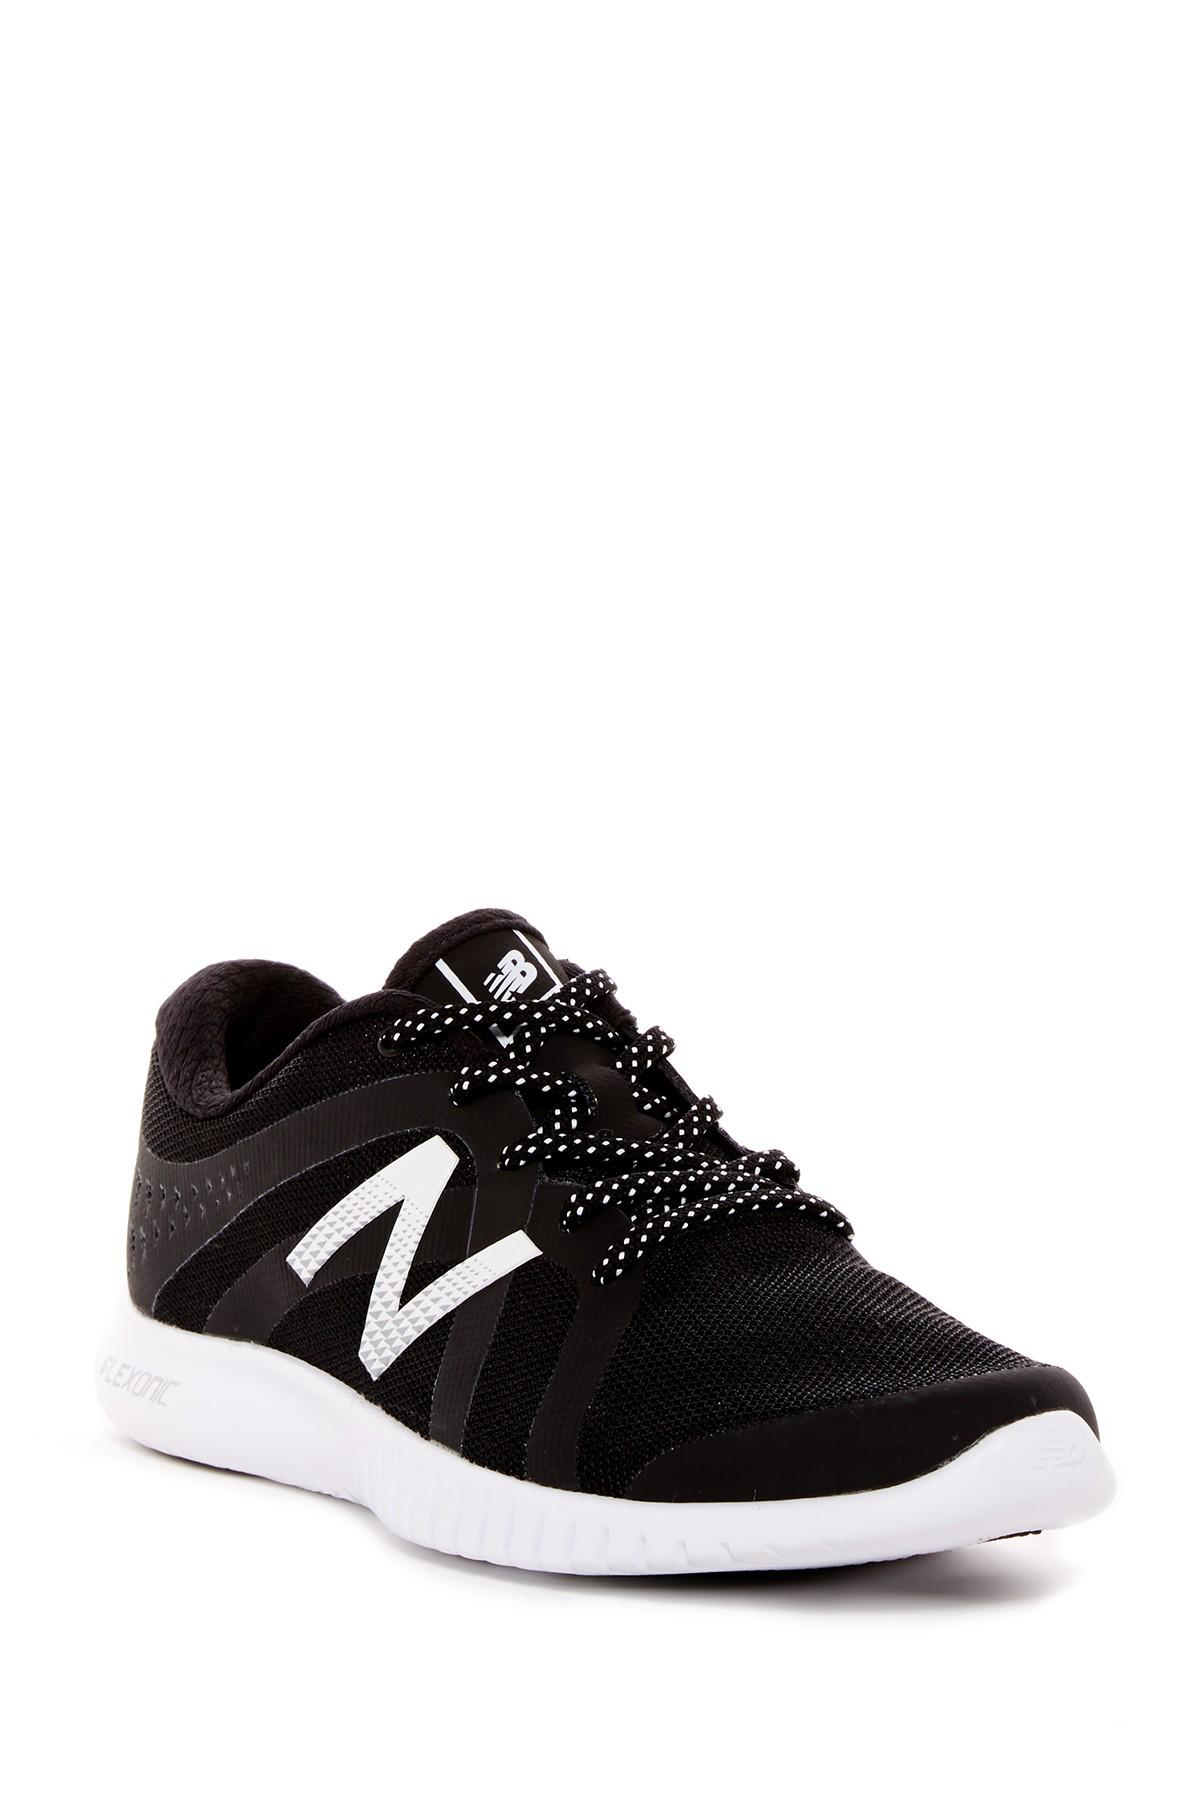 New Balance Brown Wide Shoe Mesh